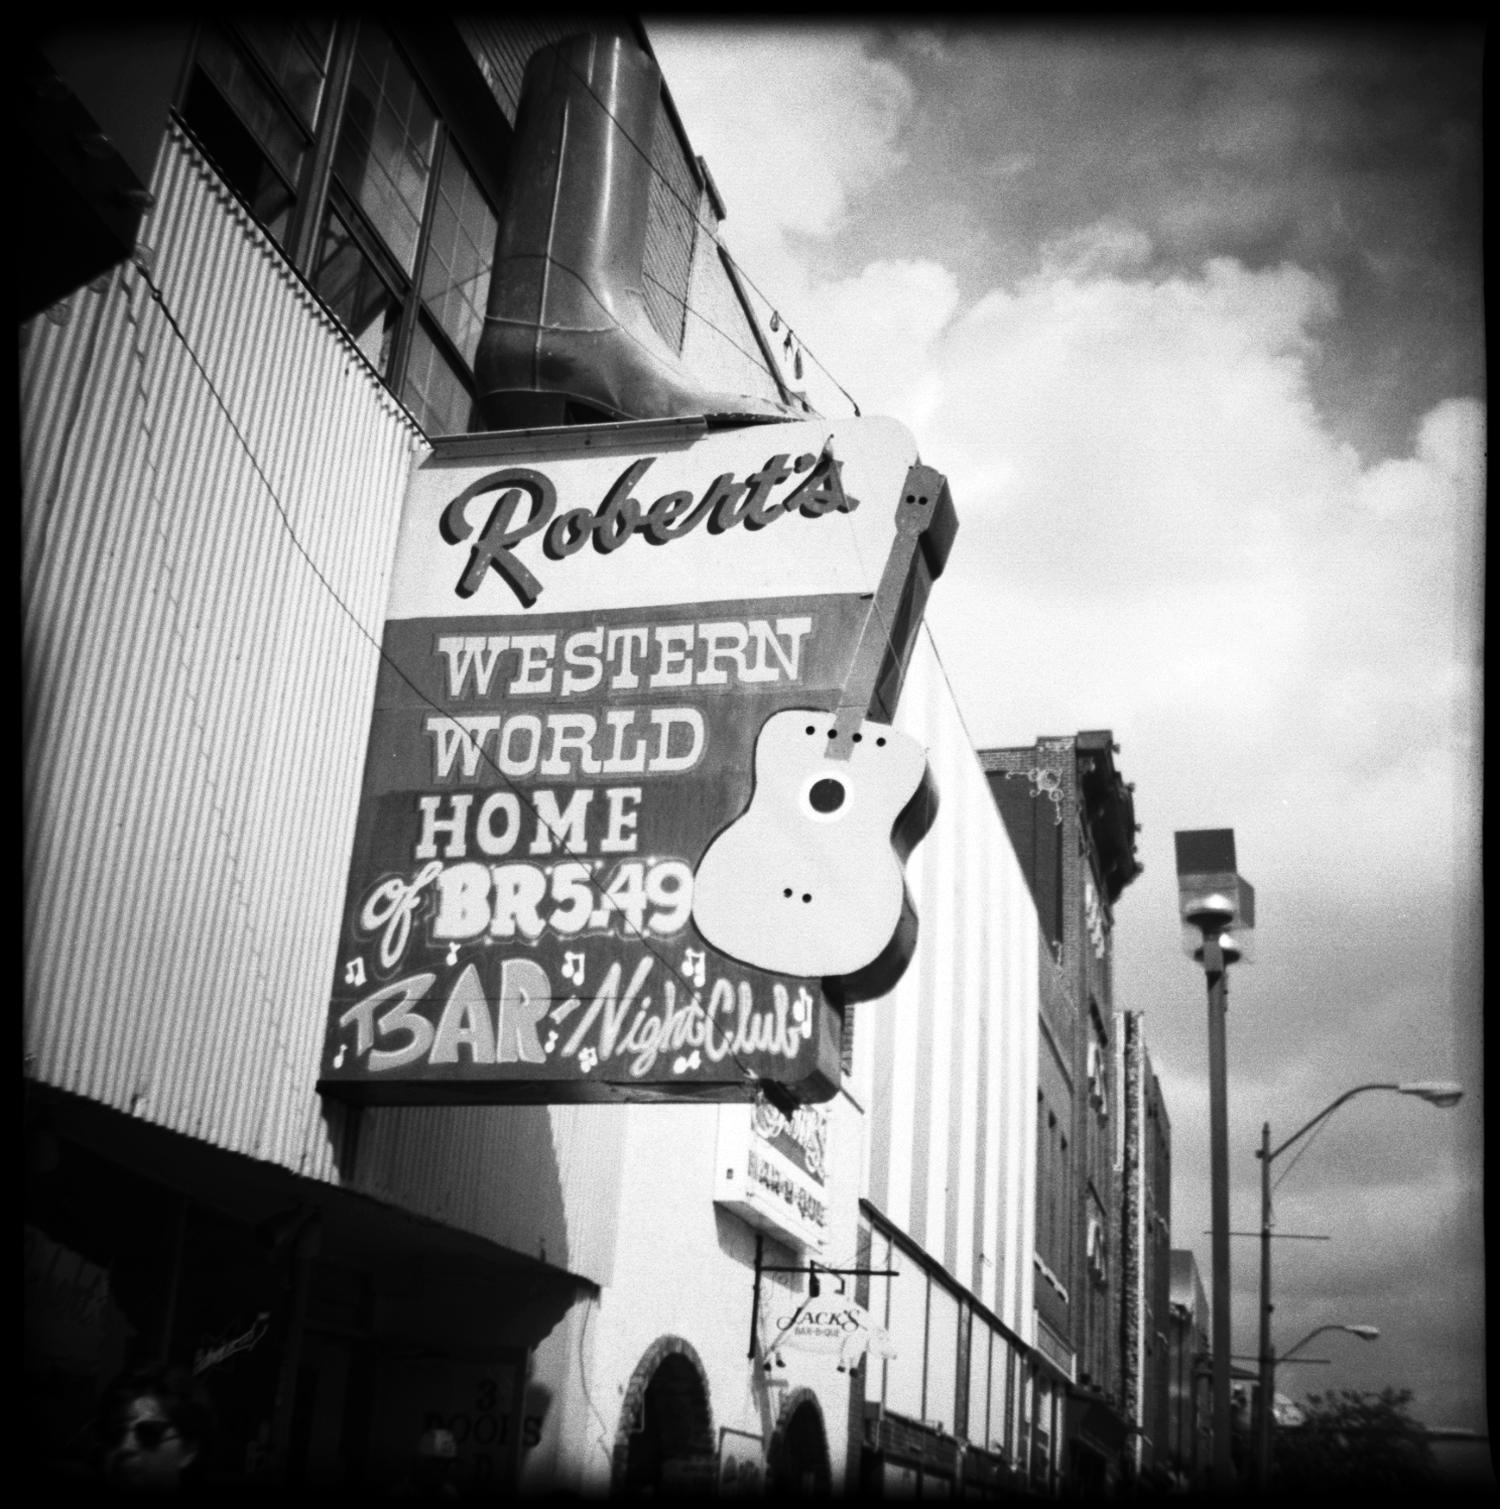 robert's.jpg